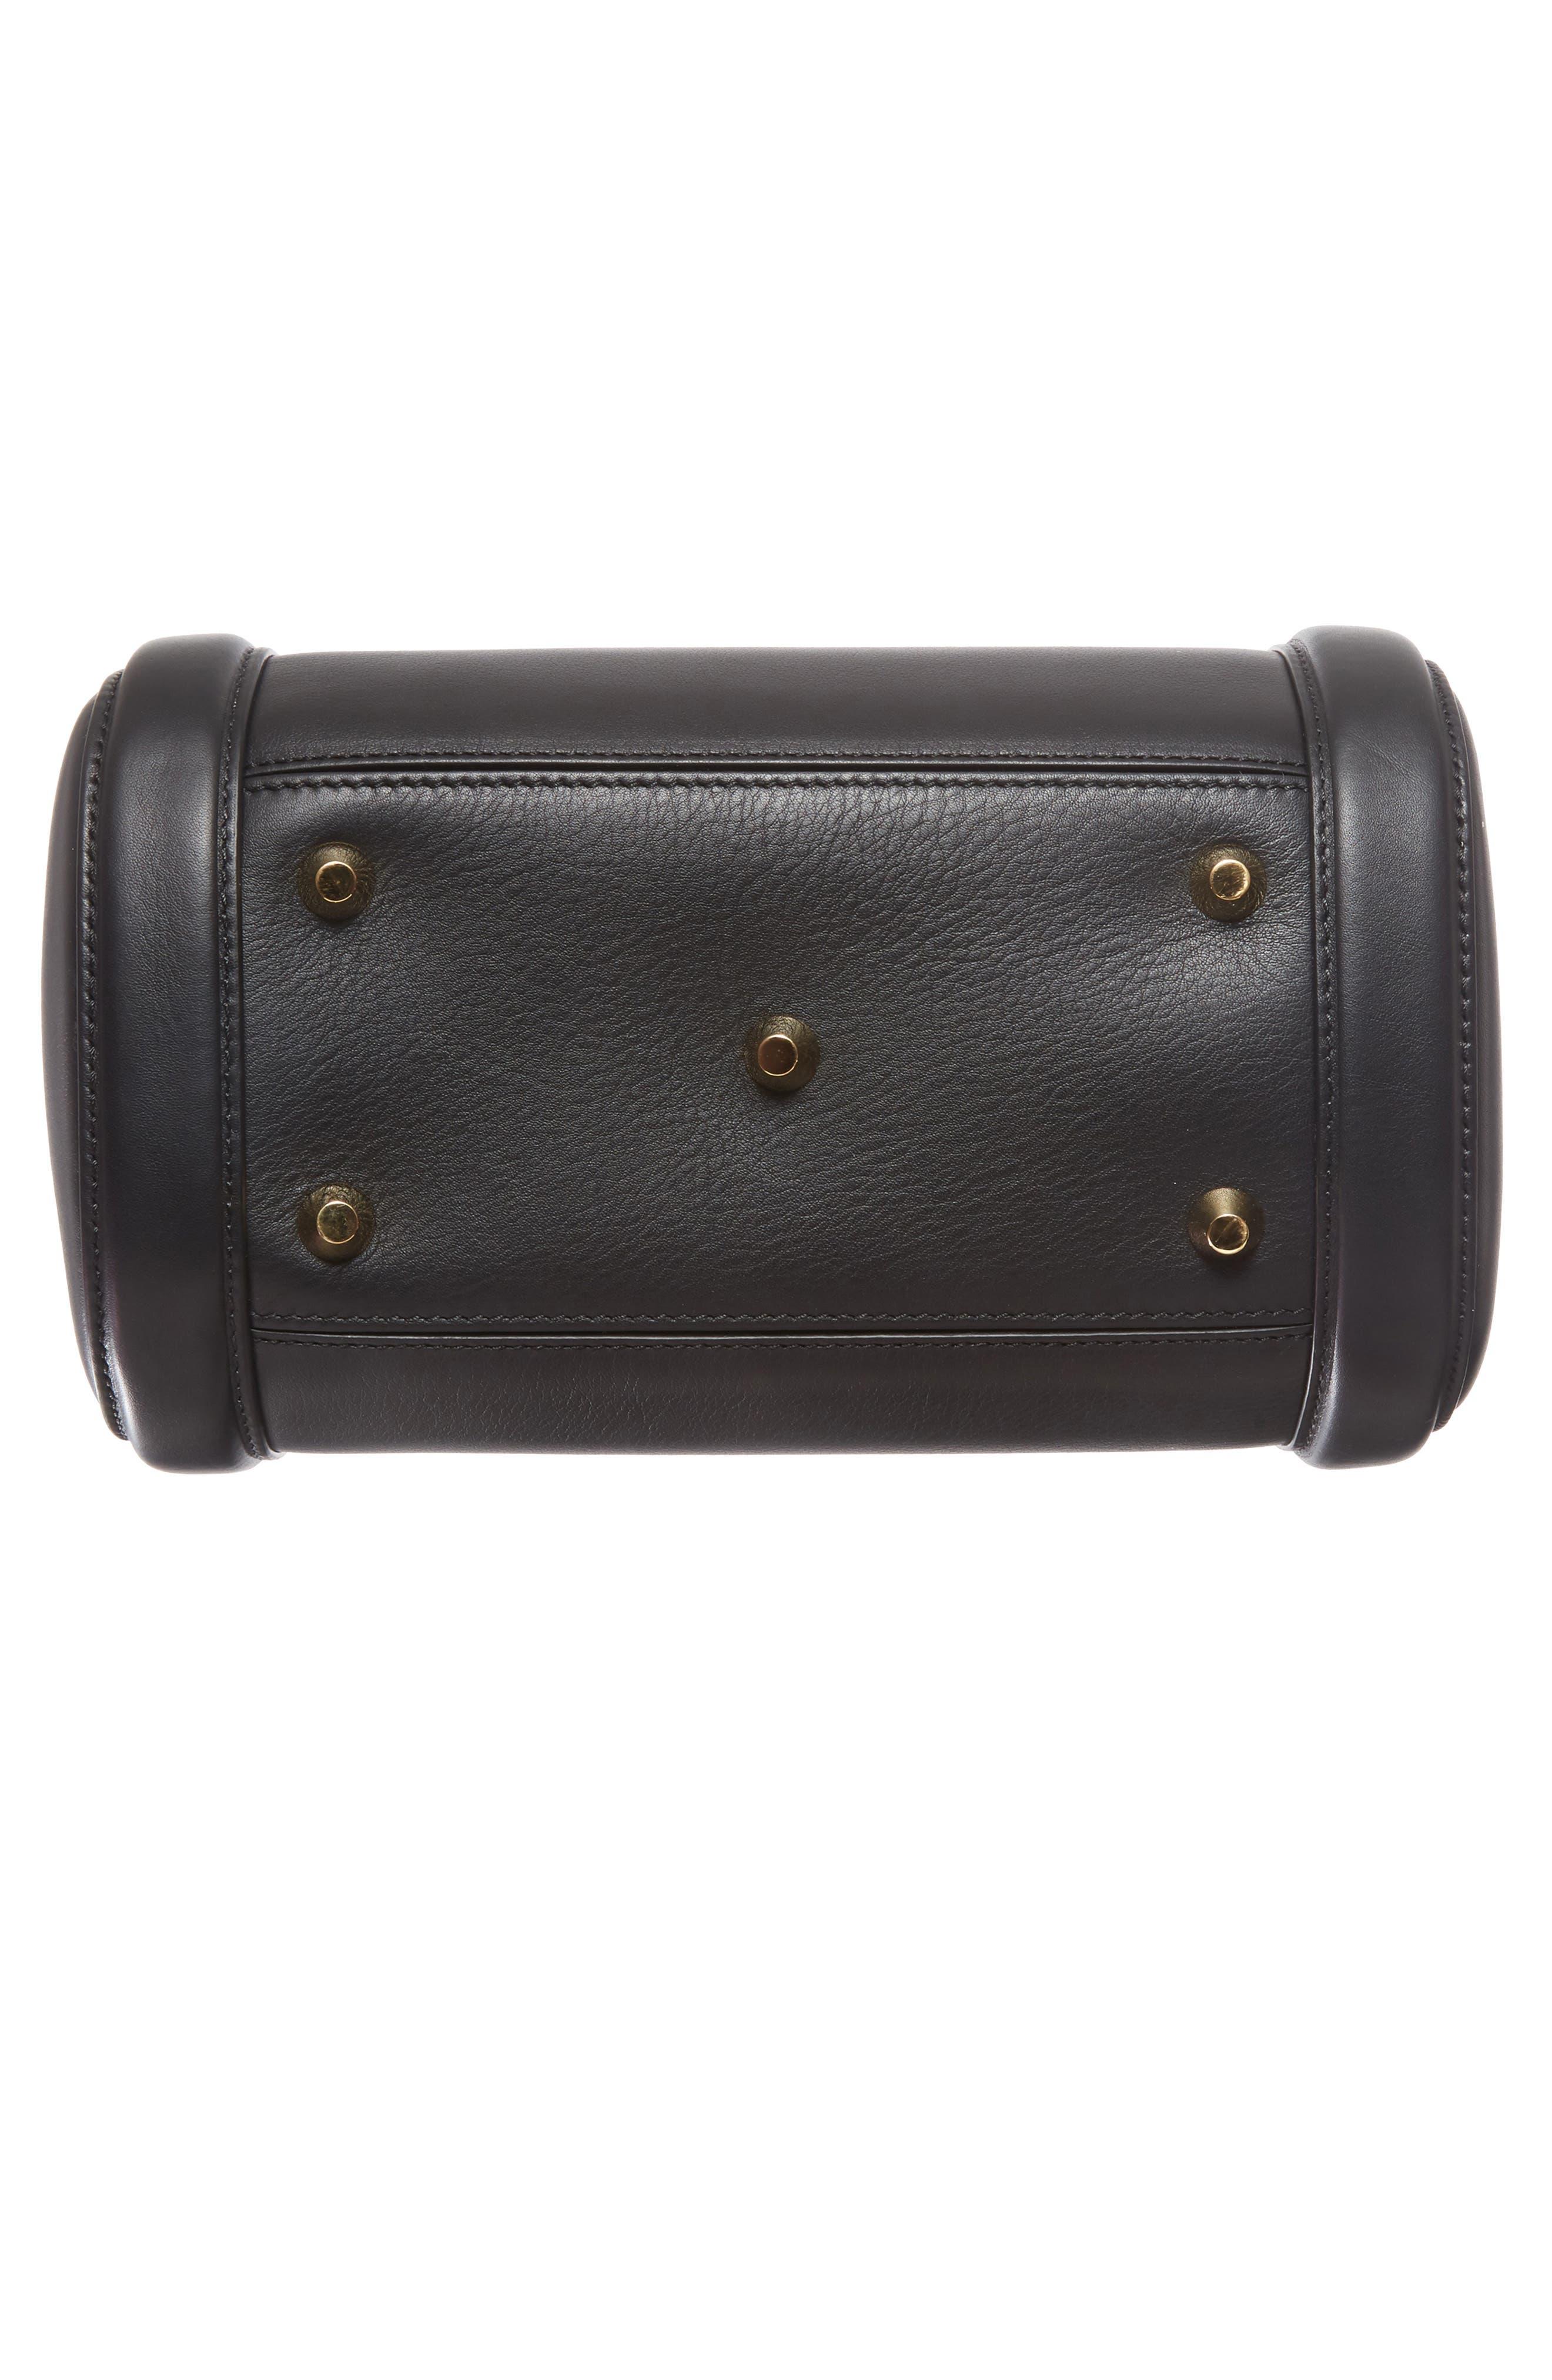 Medium Heroine Leather Satchel,                             Alternate thumbnail 6, color,                             001